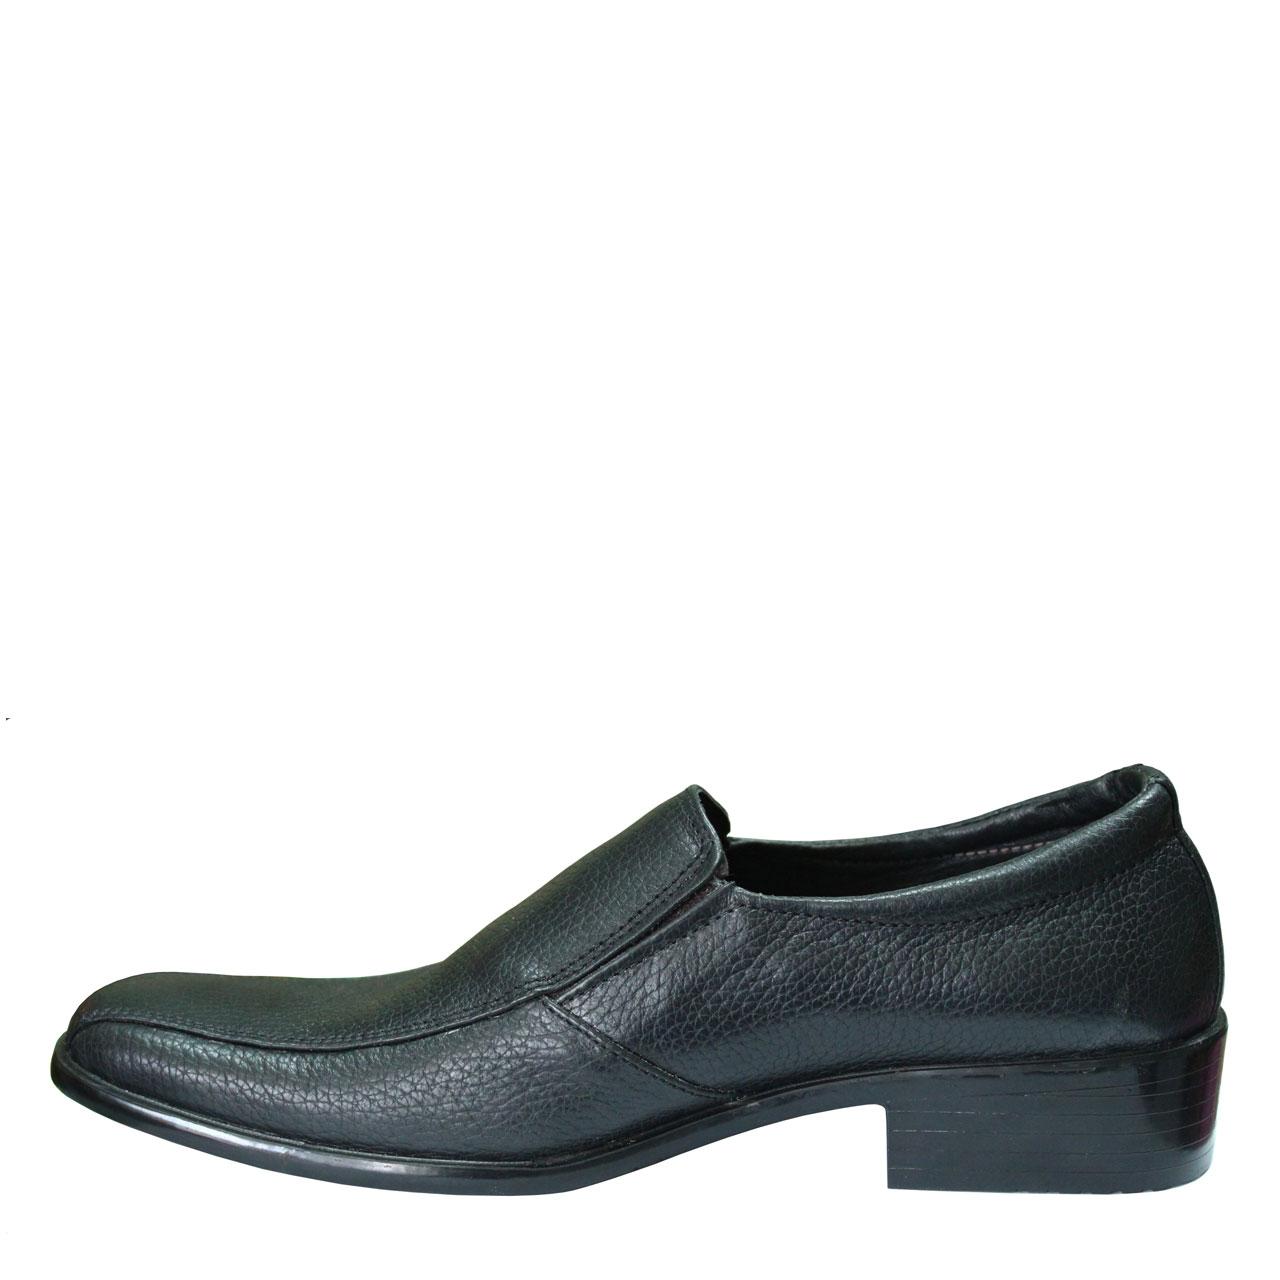 Giày nam da bò B851b